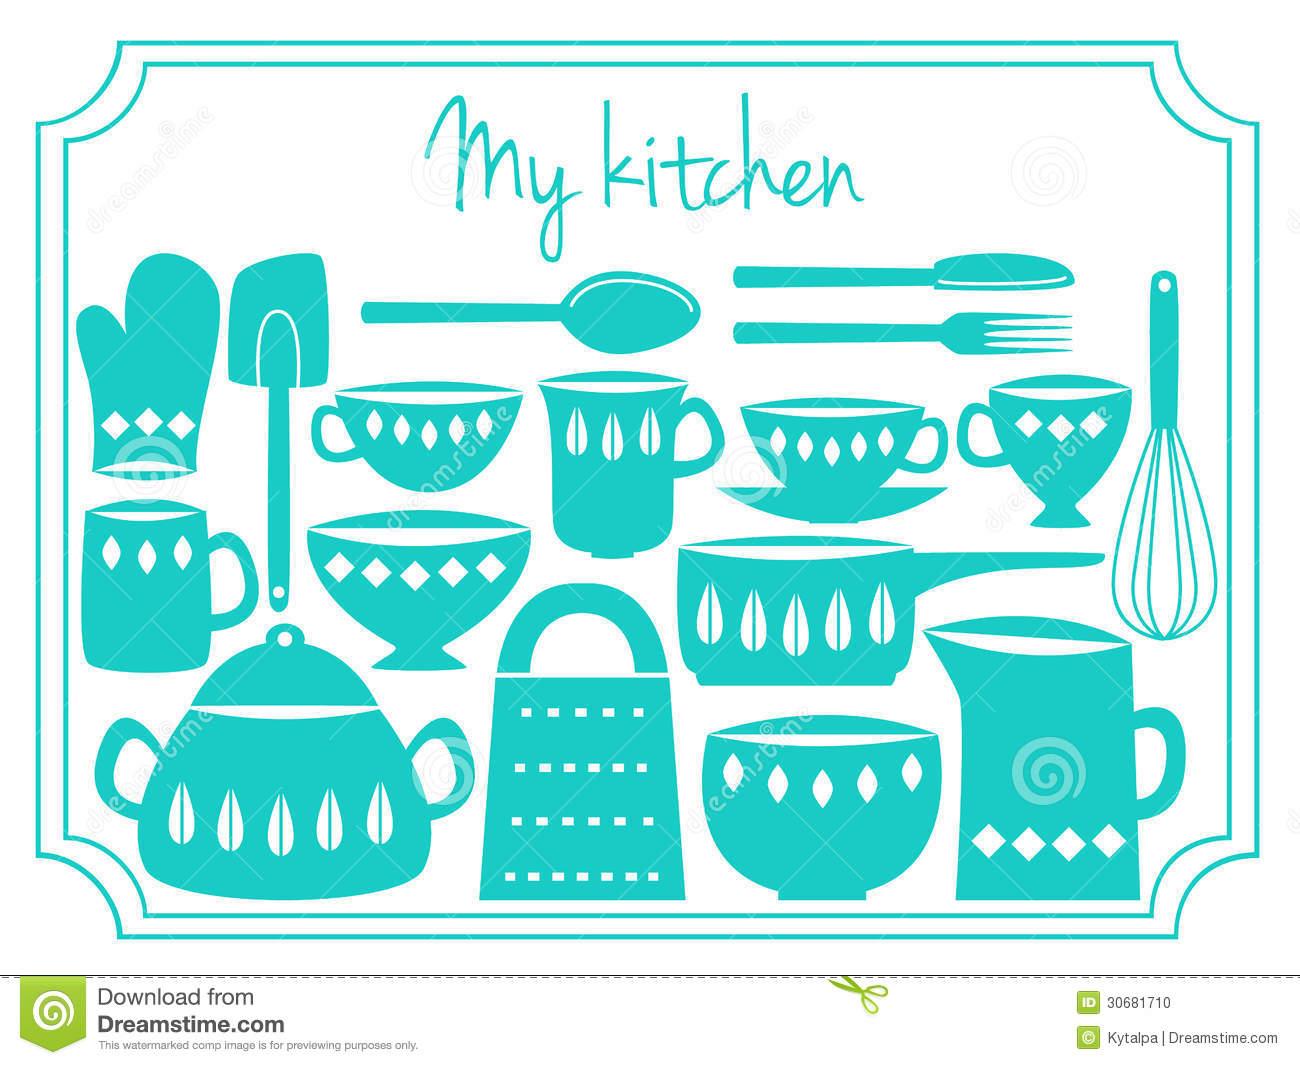 Clipart Ustensiles De Cuisine Unique Photos Label D Ustensiles De Cuisine Stock Illustrations Vecteurs